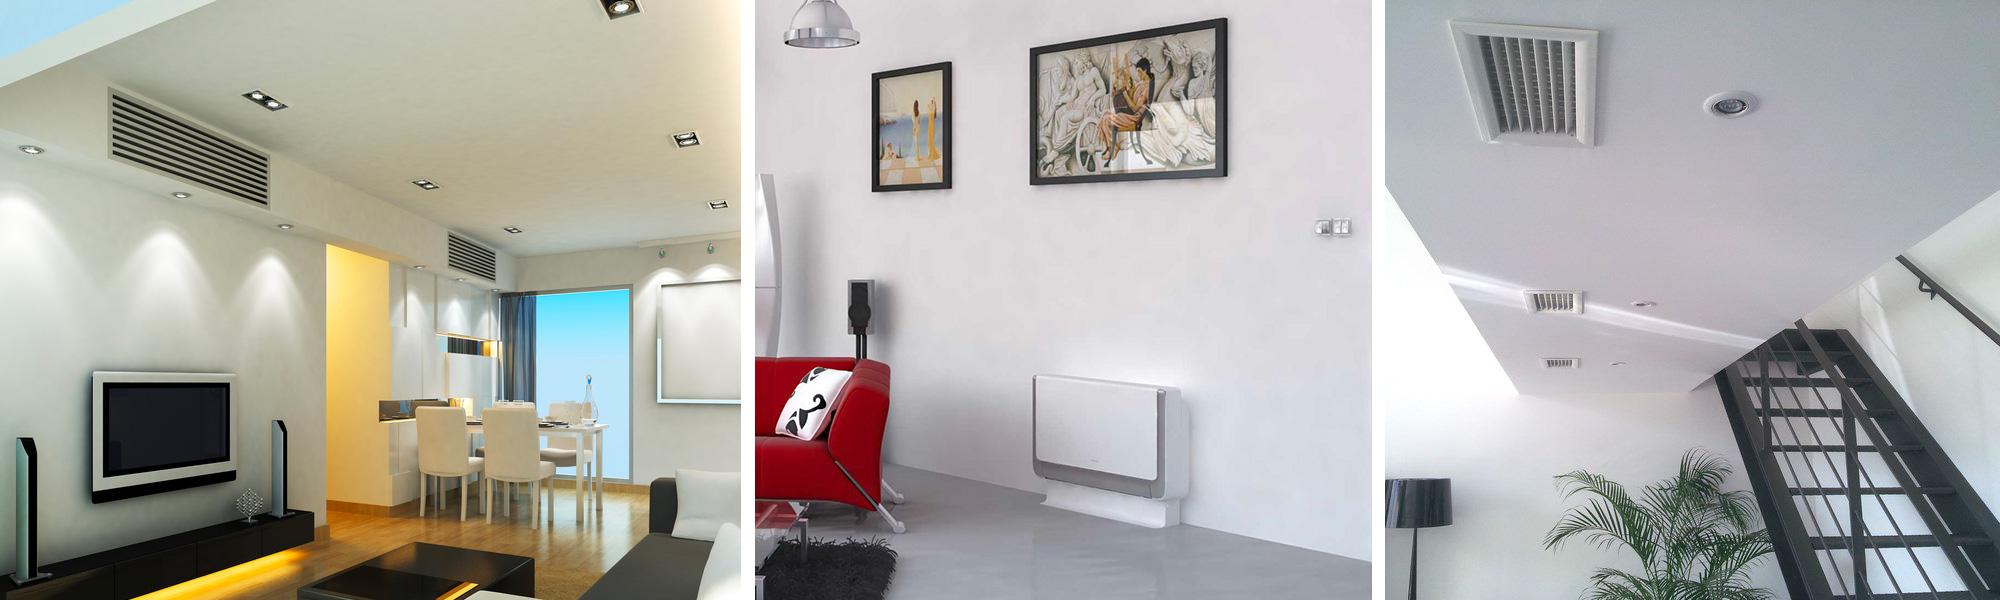 climatisation gaine et murale